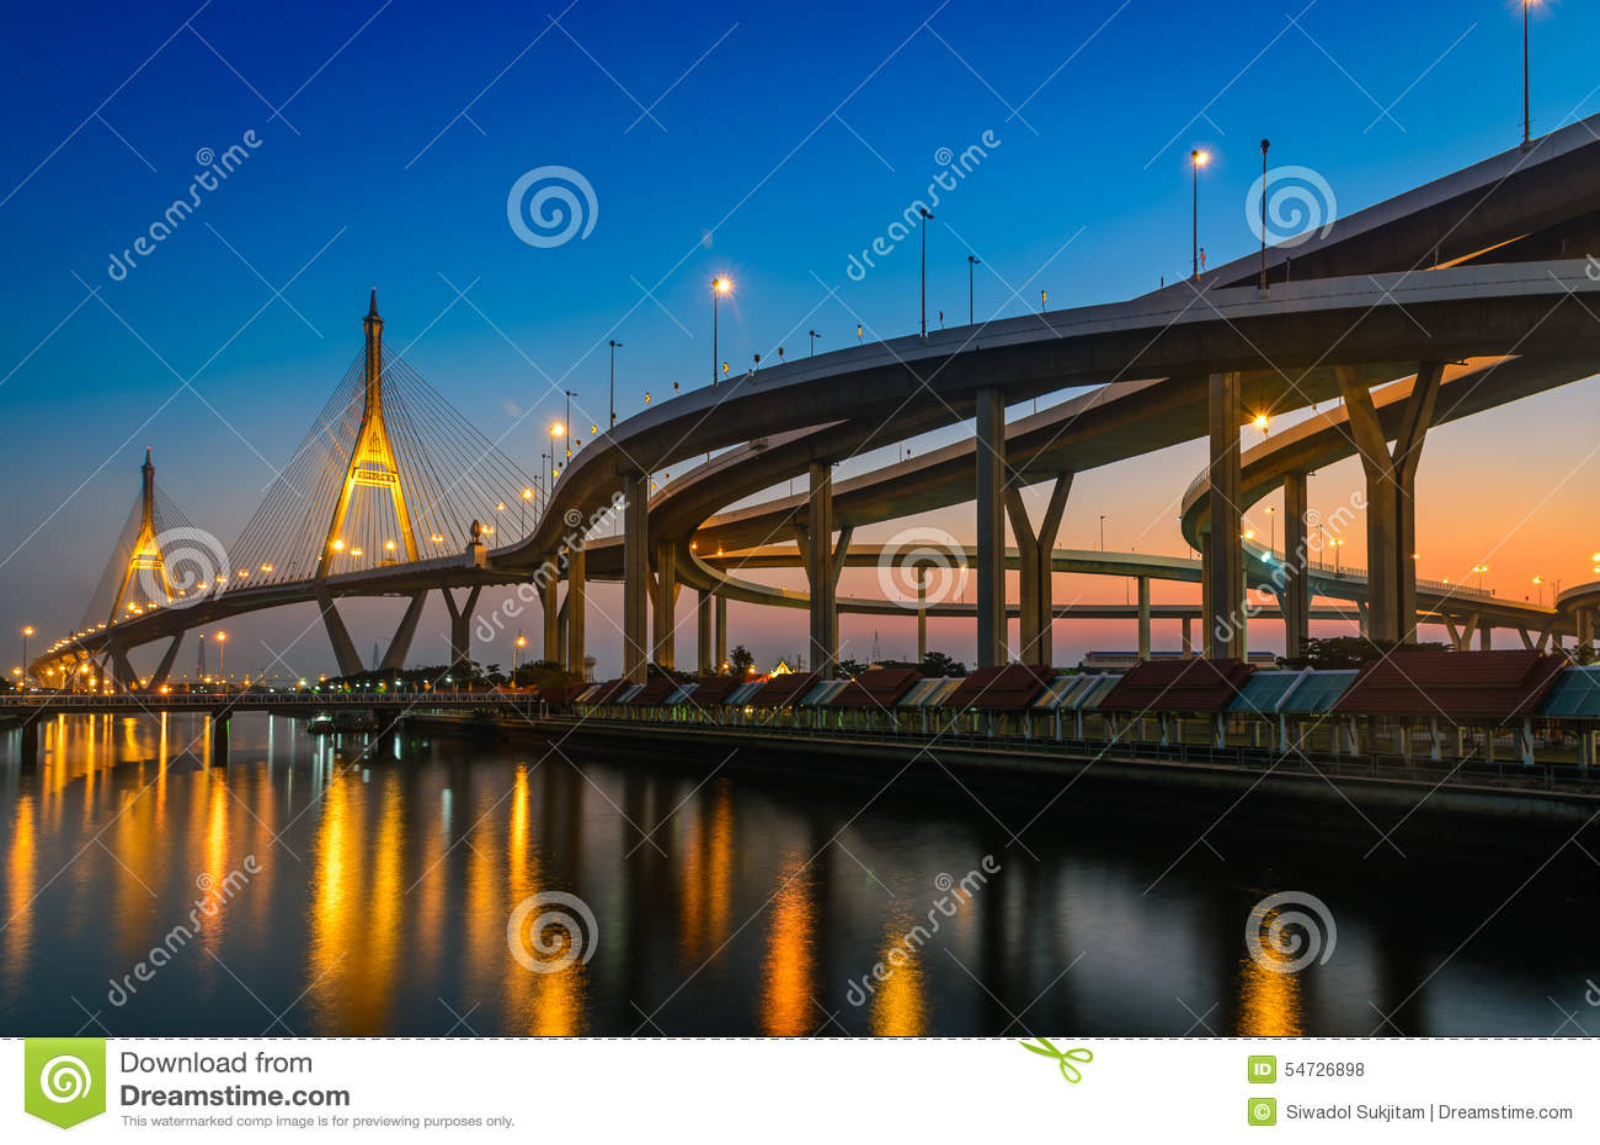 Sunset time at bhumibol bridge